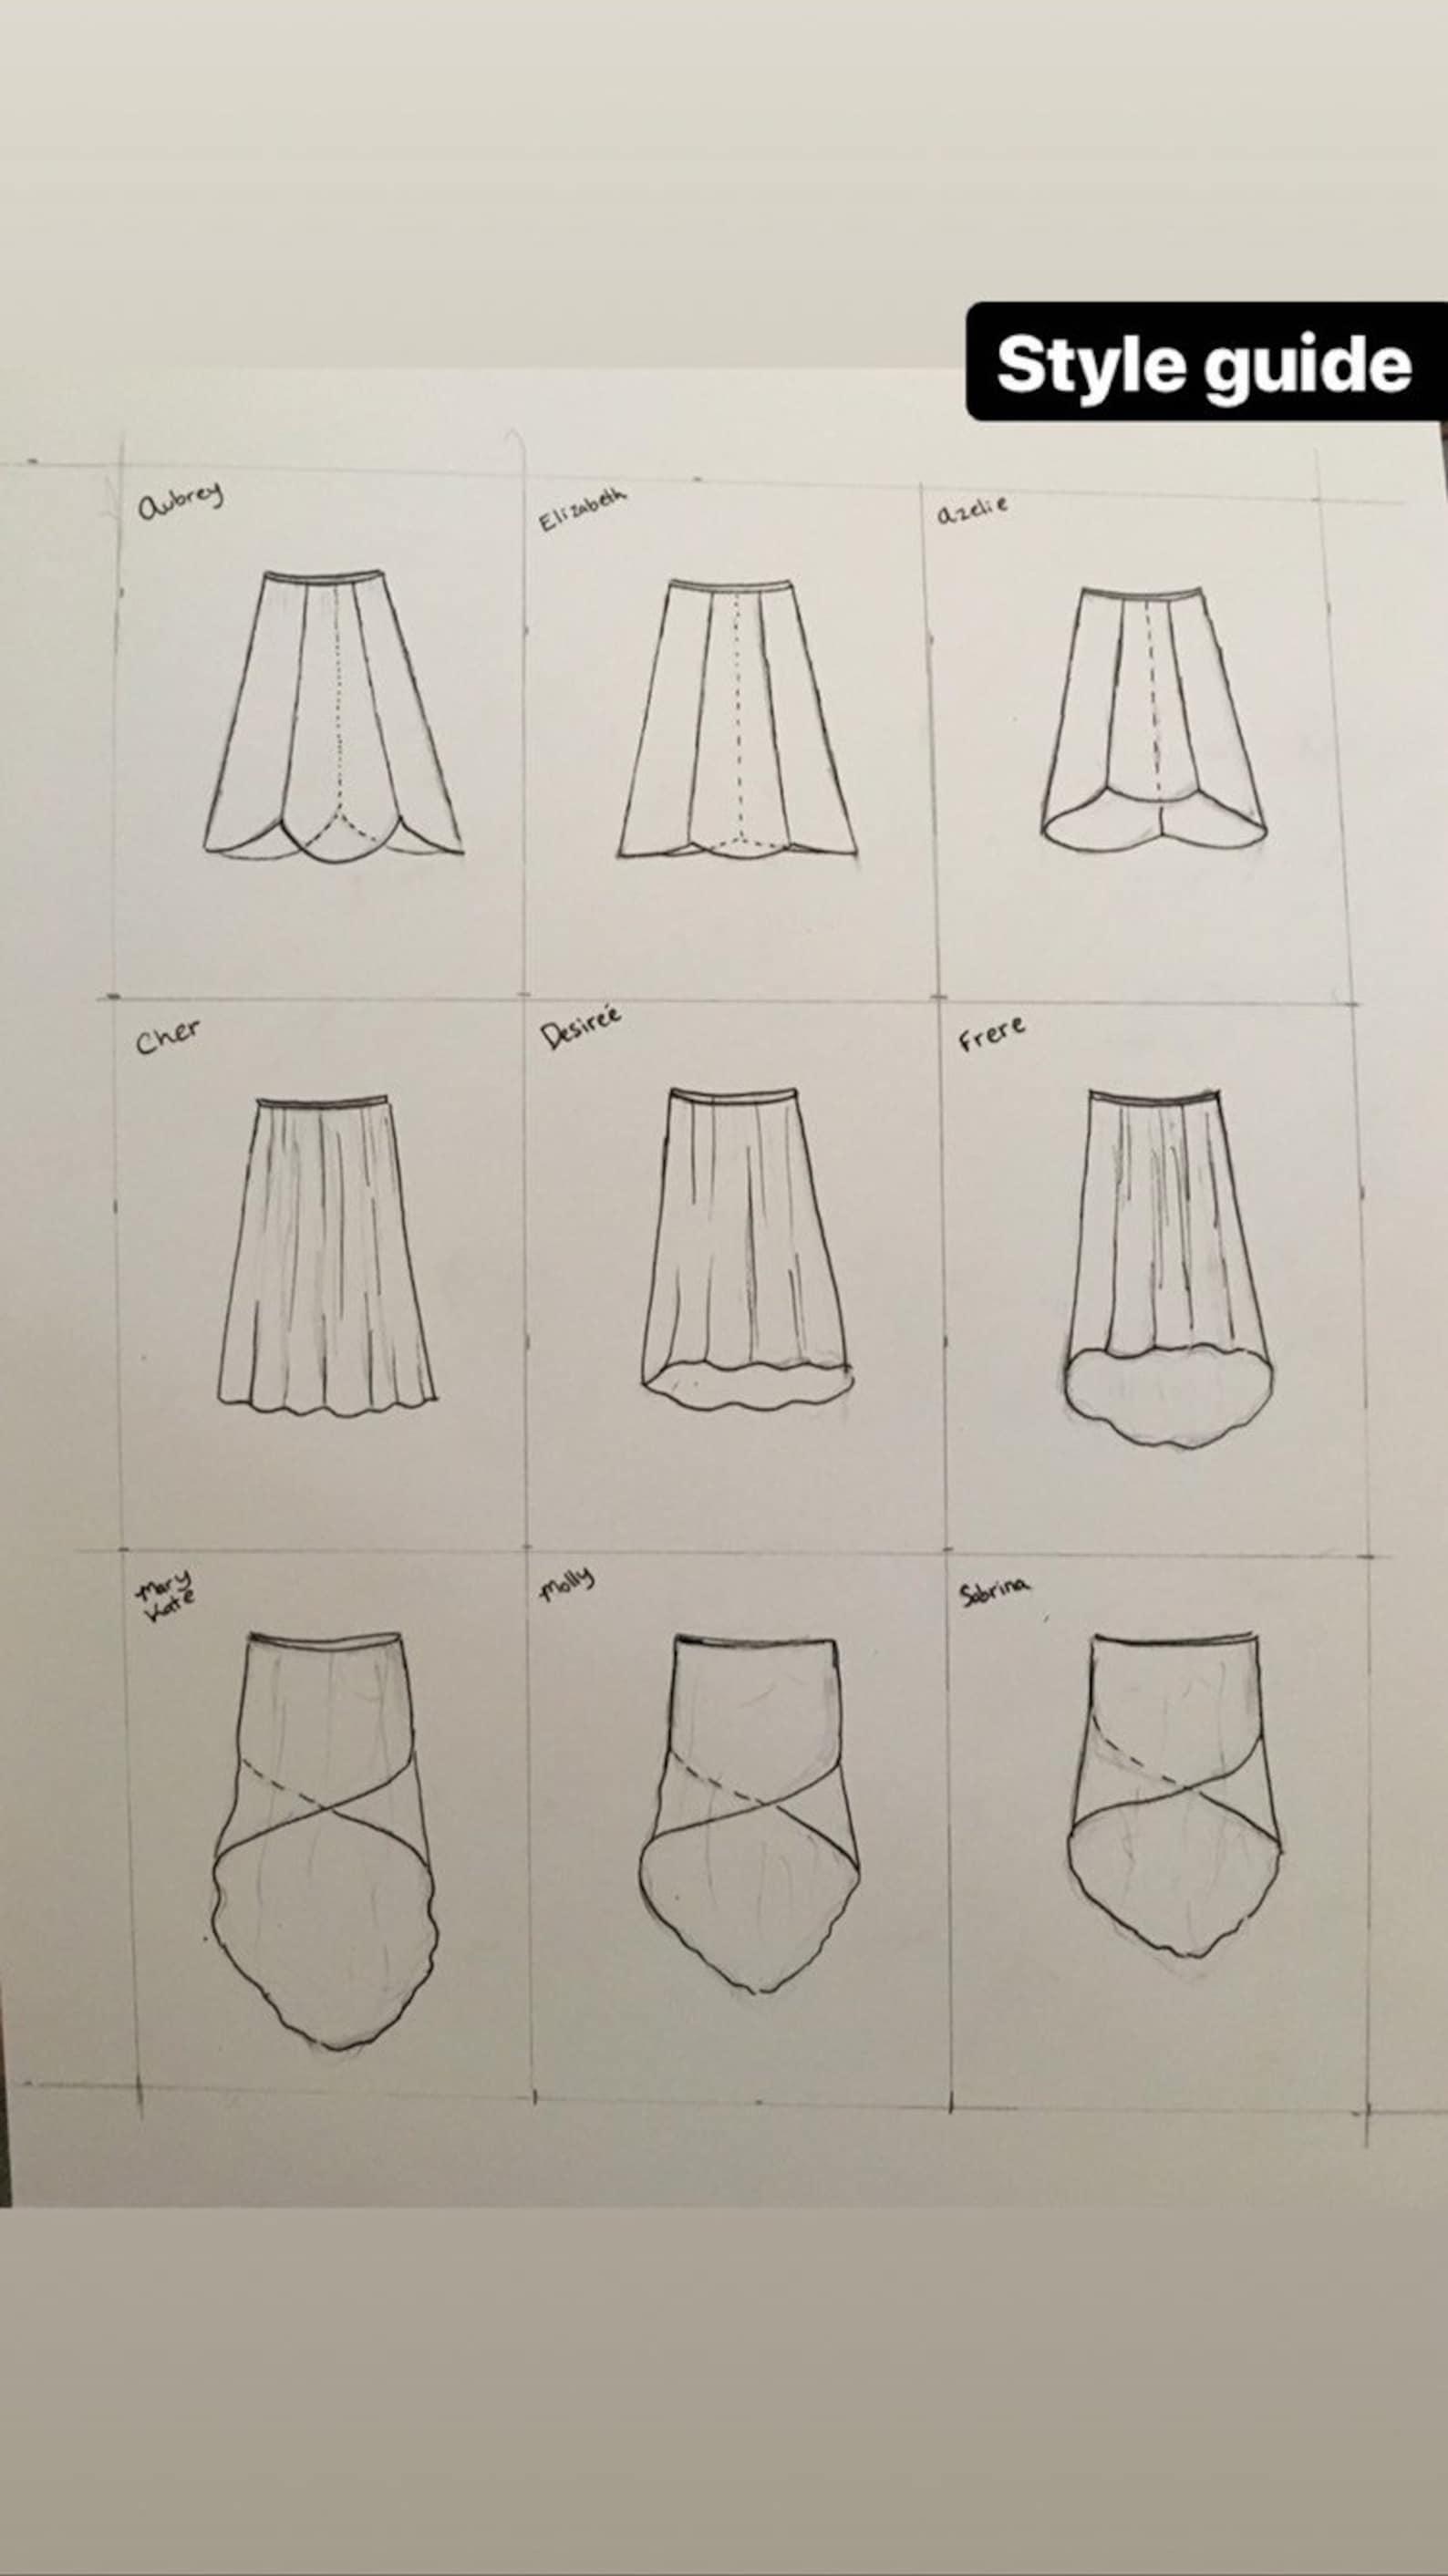 toi toi toi ballet wrap skirt long style! rehearsal, class, performance. tropical print. molly style.